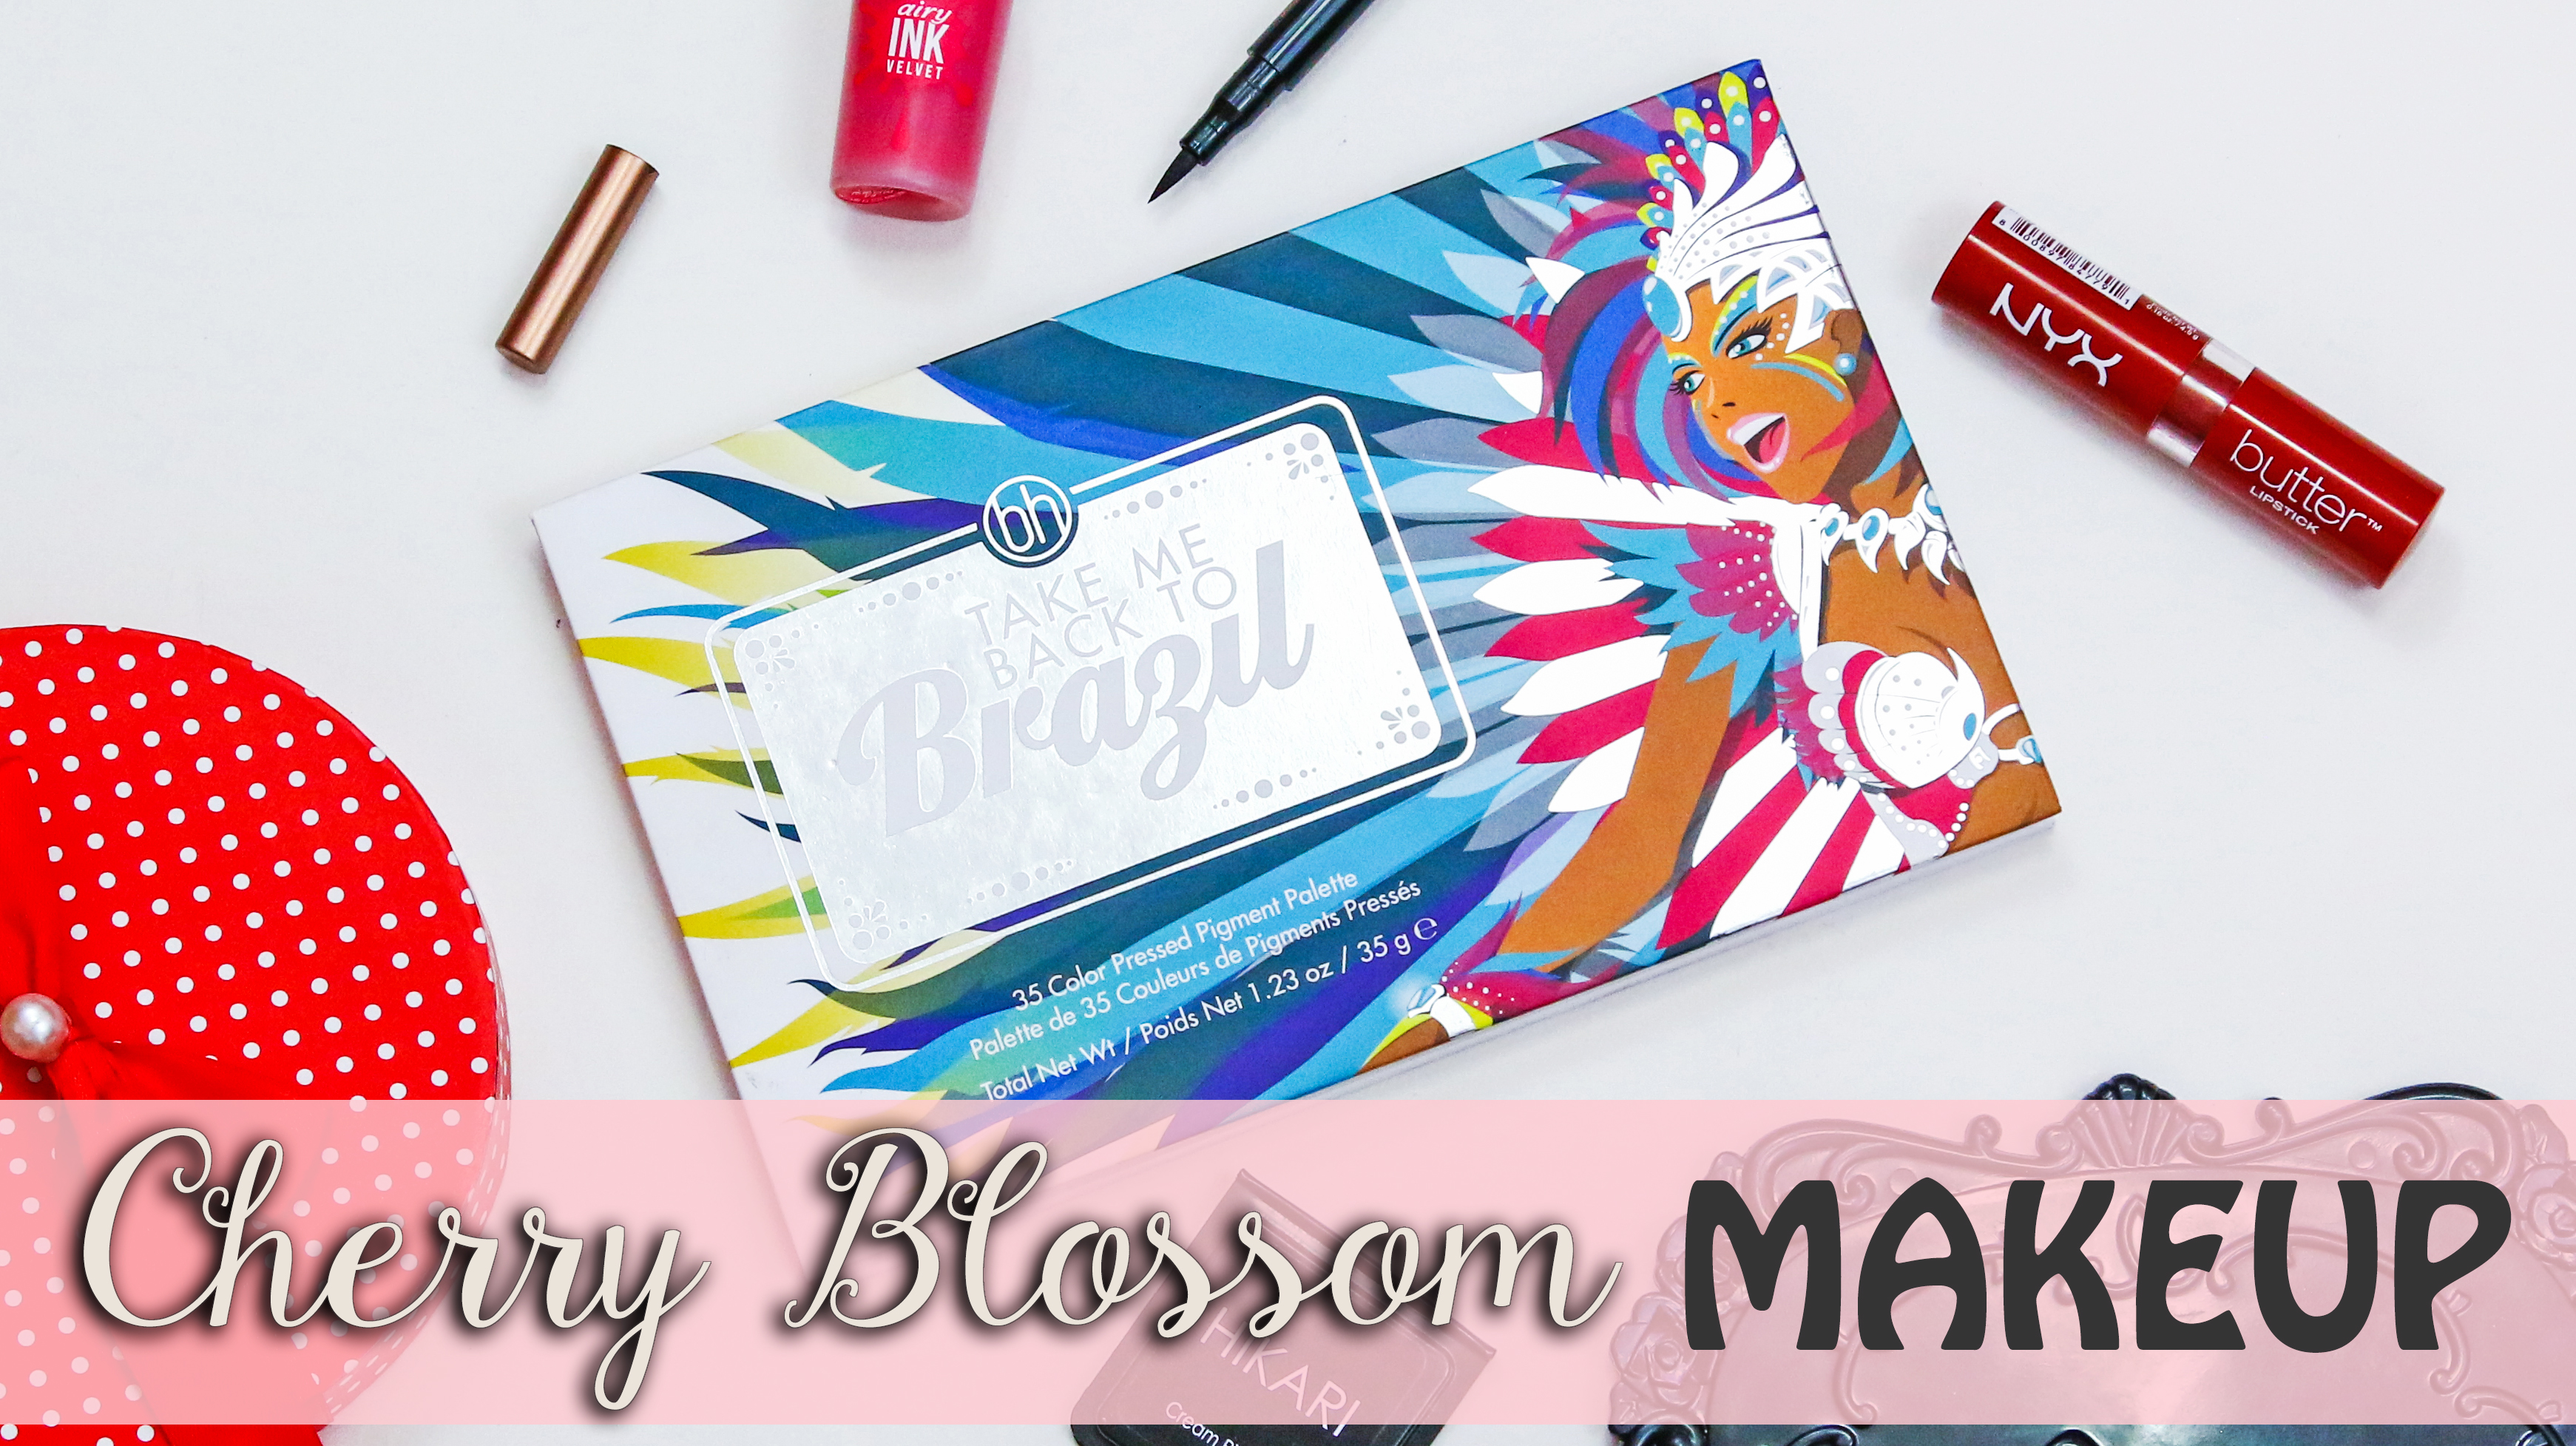 Spring Makeup Cherry Blossom Makeup Tutorial   BH Cosmetics Take Me Back to Brazil Palette